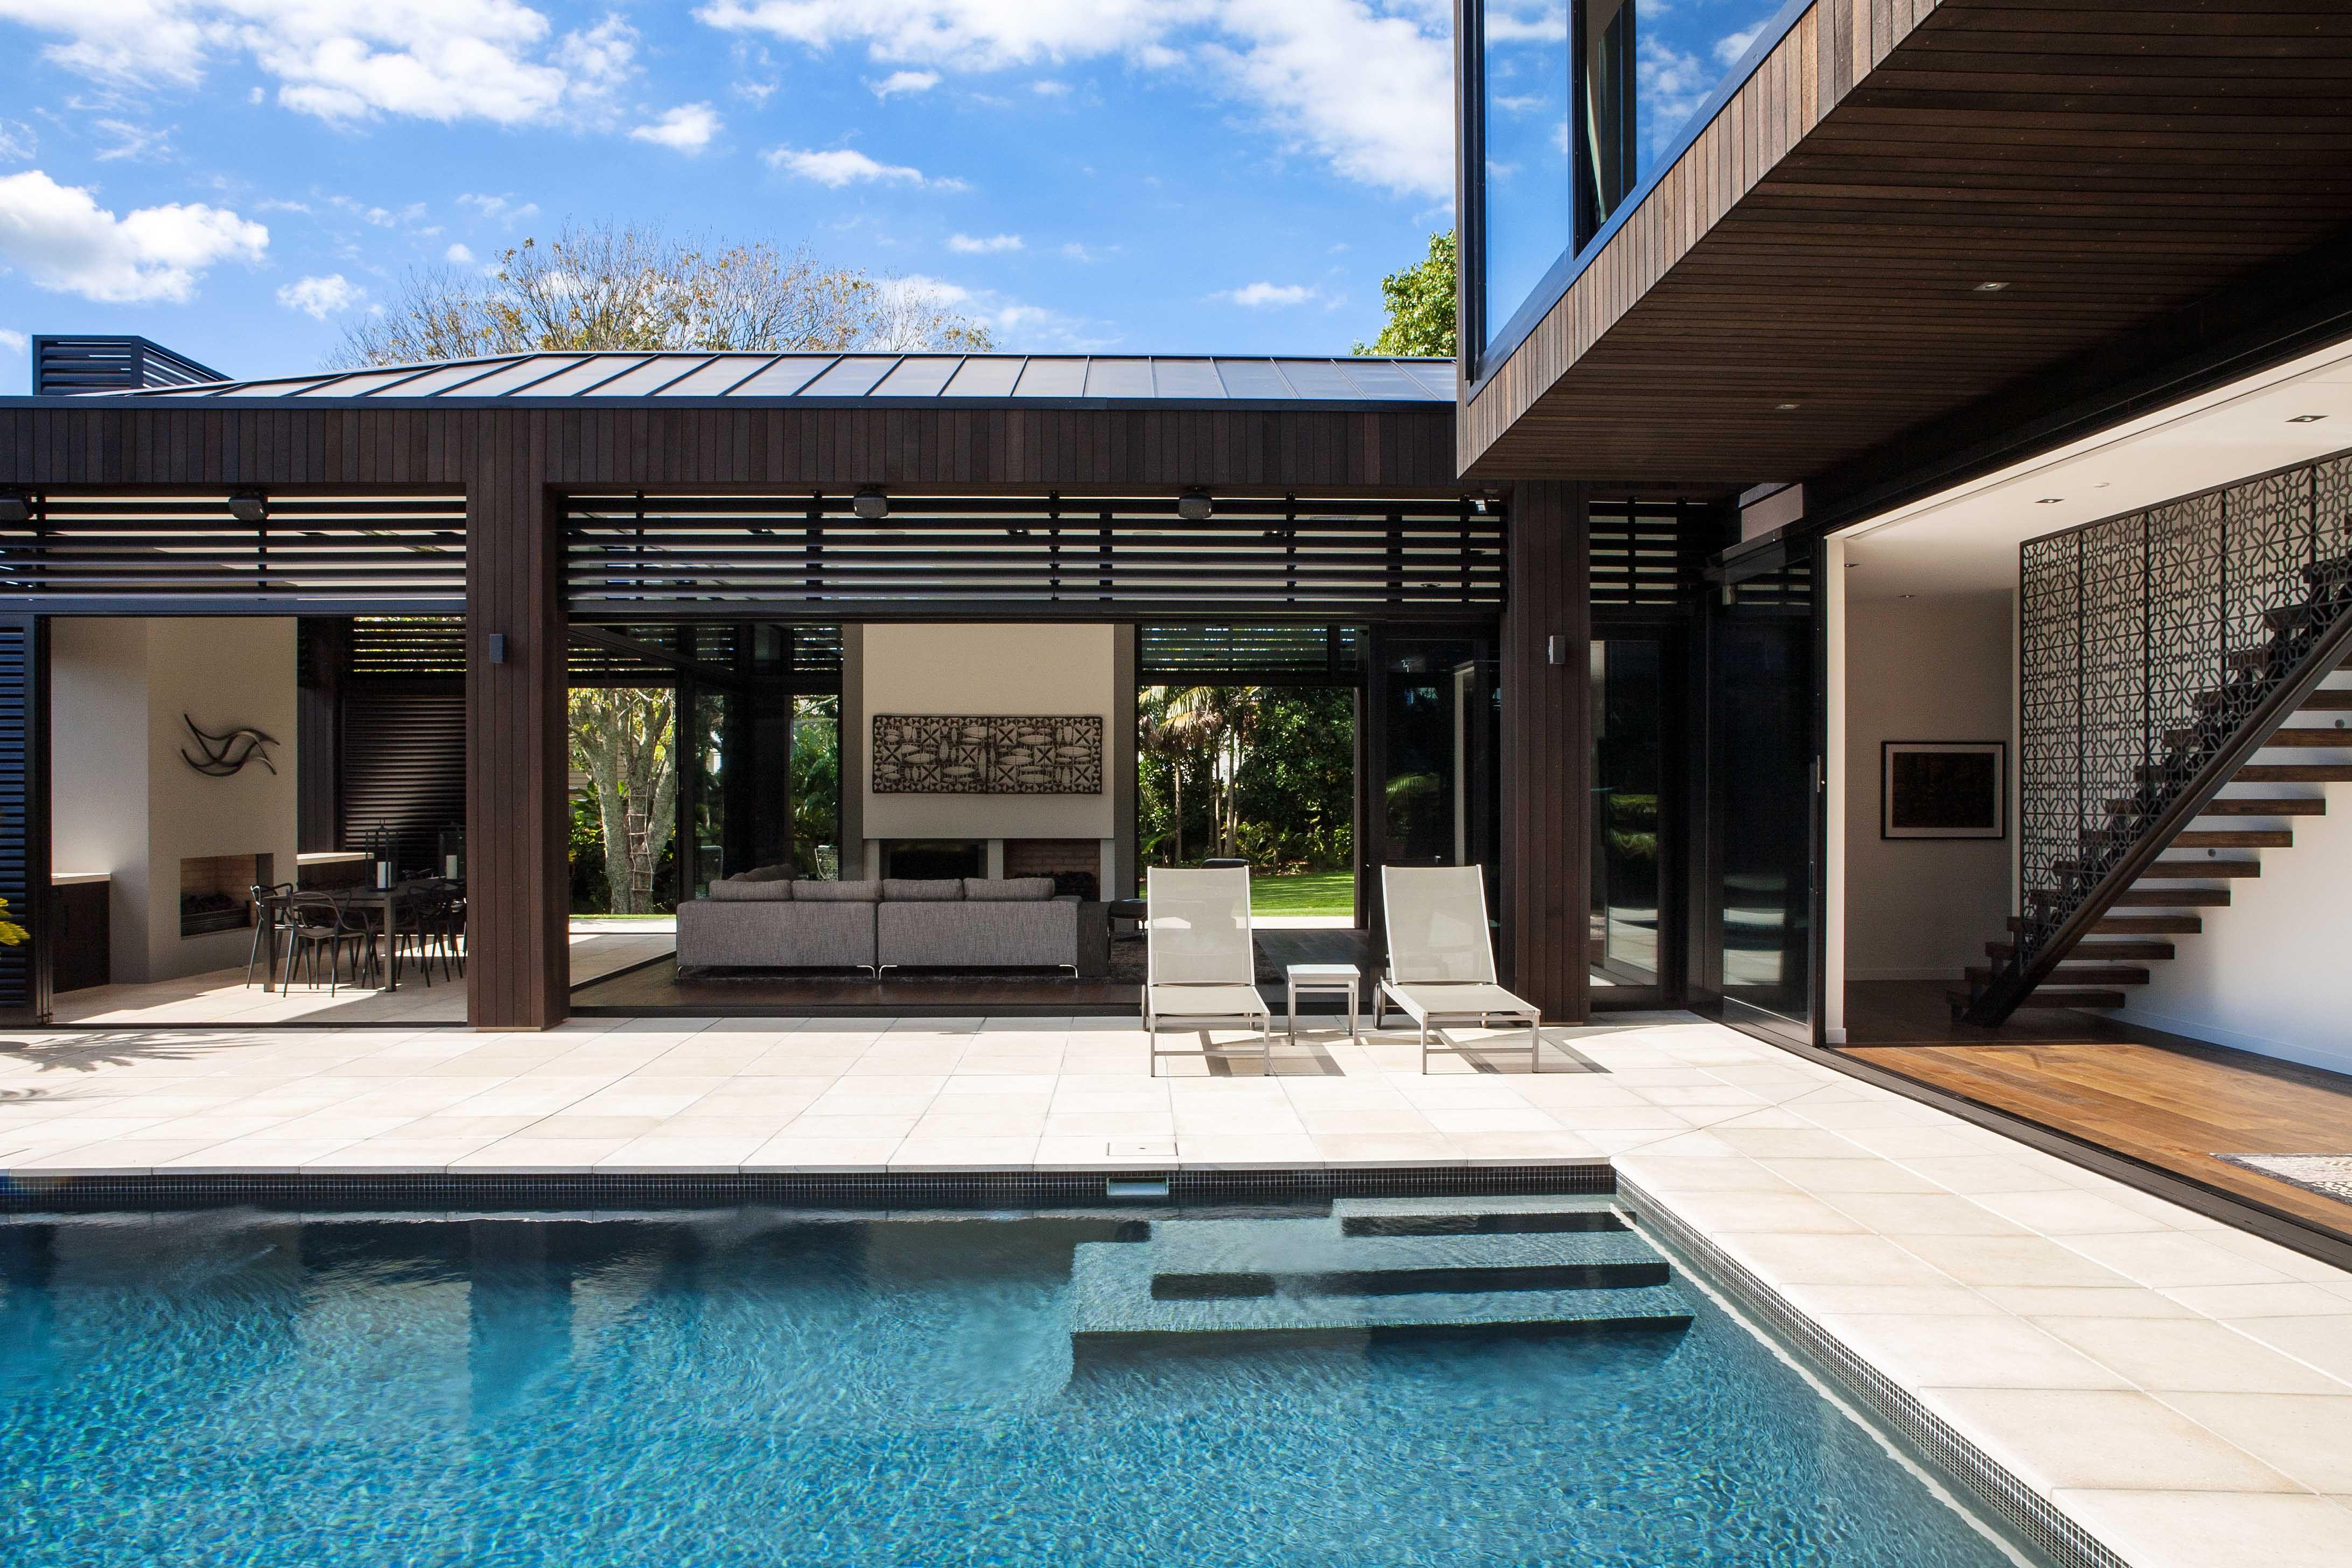 Best Colorsteel® Ebony Roofing Auckland Pool House Designs 400 x 300